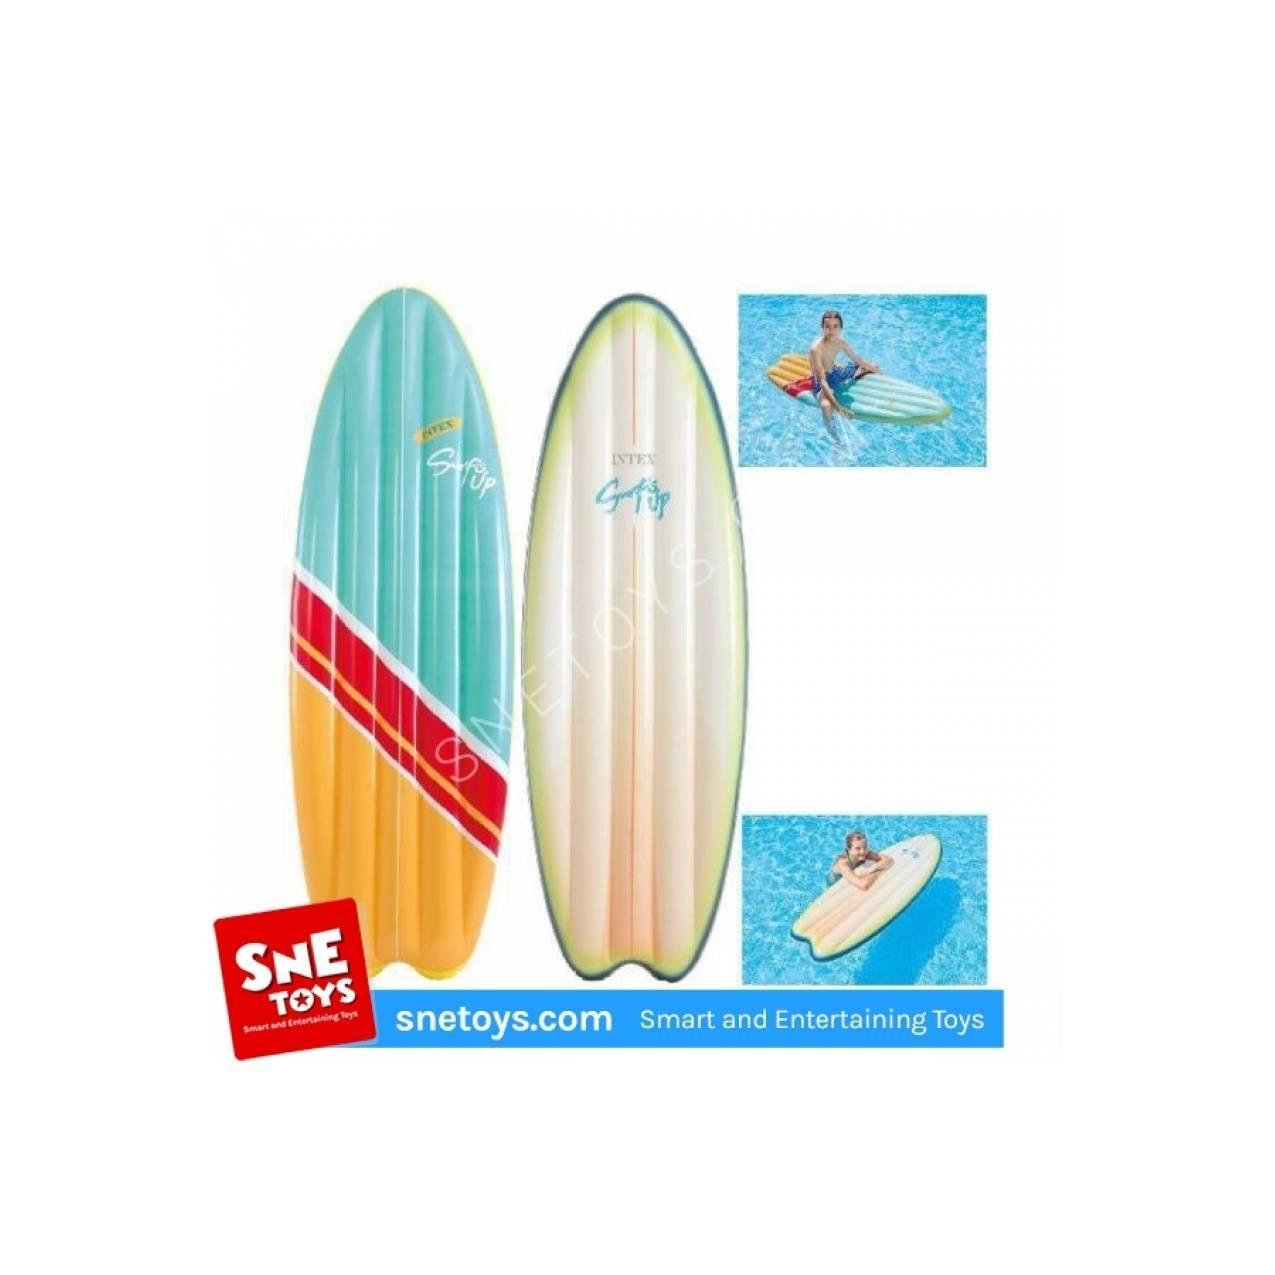 Promo Terlaris Pelampung Lengan Roll Up Arm Bands Pool School Step 3 Intex 56643 Termurah Kolam Renang Swim Center See Through Round 57489 Blue Surfs Mats Inflatable Surfboard Float Rafts